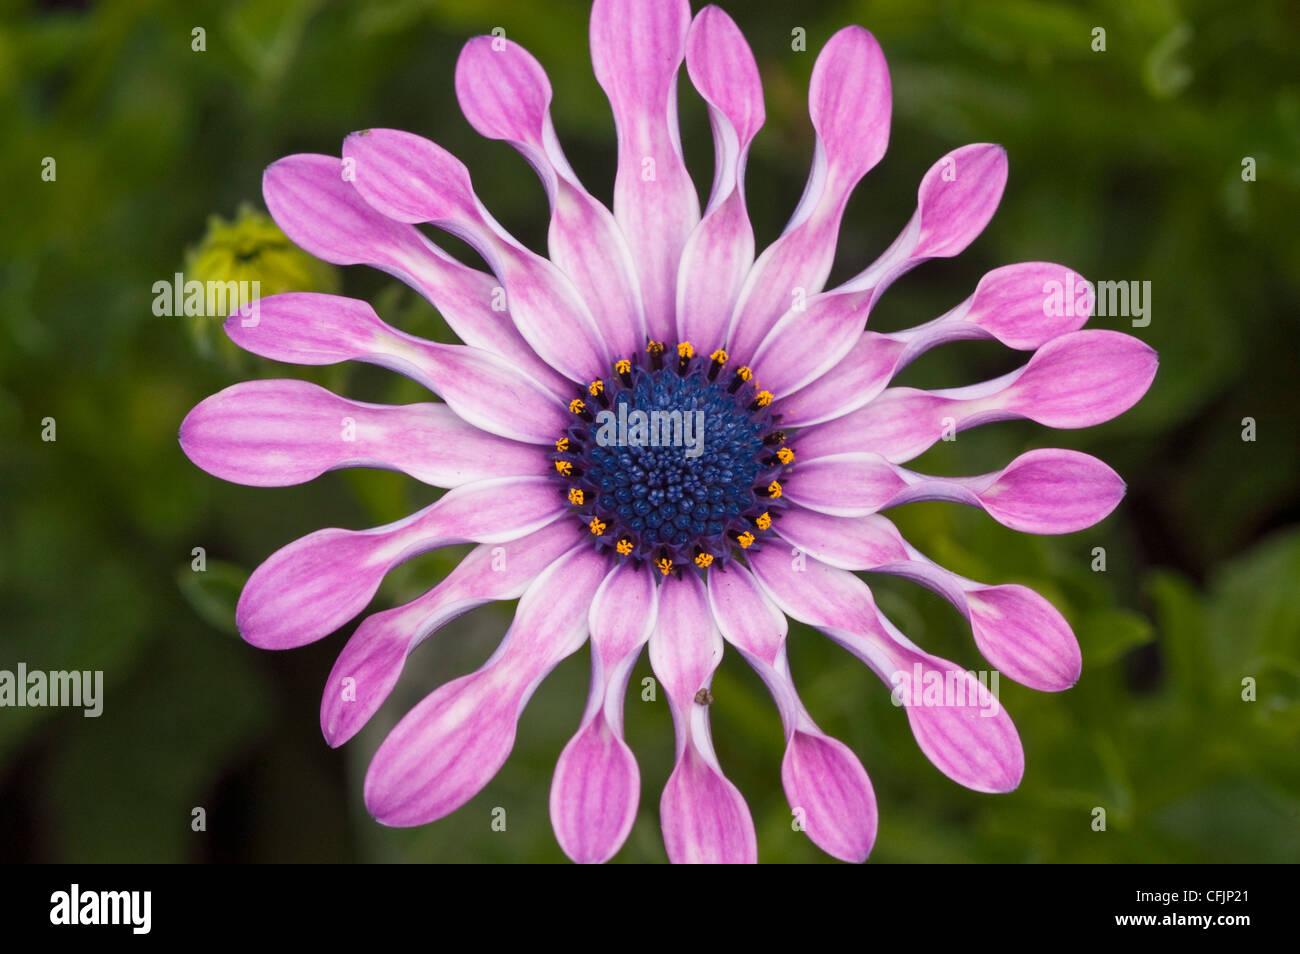 Rosa Blume Nahaufnahme von Osteospermum Hybride, Sopran® lila Löffel Stockfoto